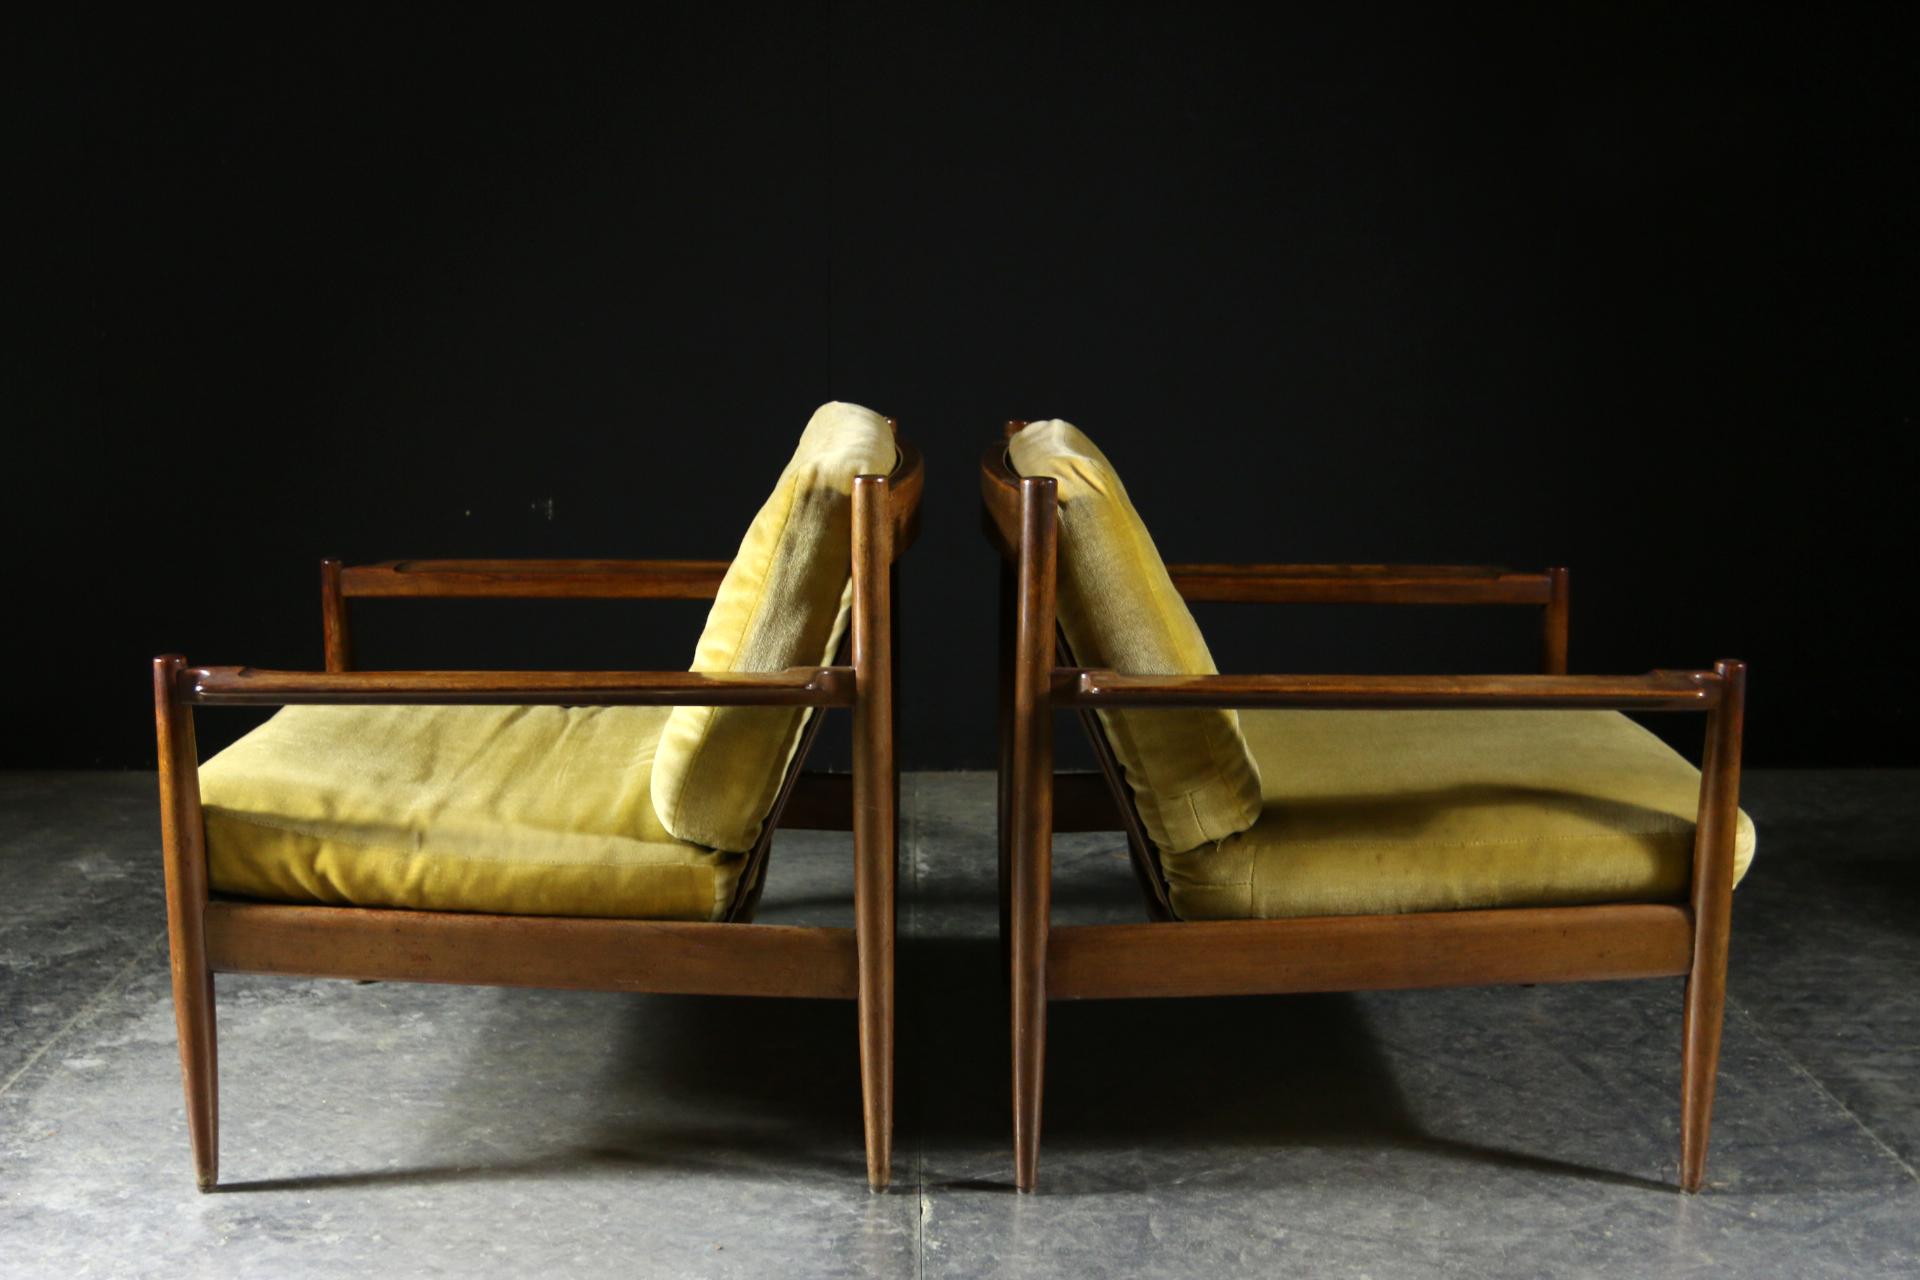 Vintage Design Fauteuil.Top Vintage Design Teakhout Fauteuils Jaren 50 Dehuiszwaluw